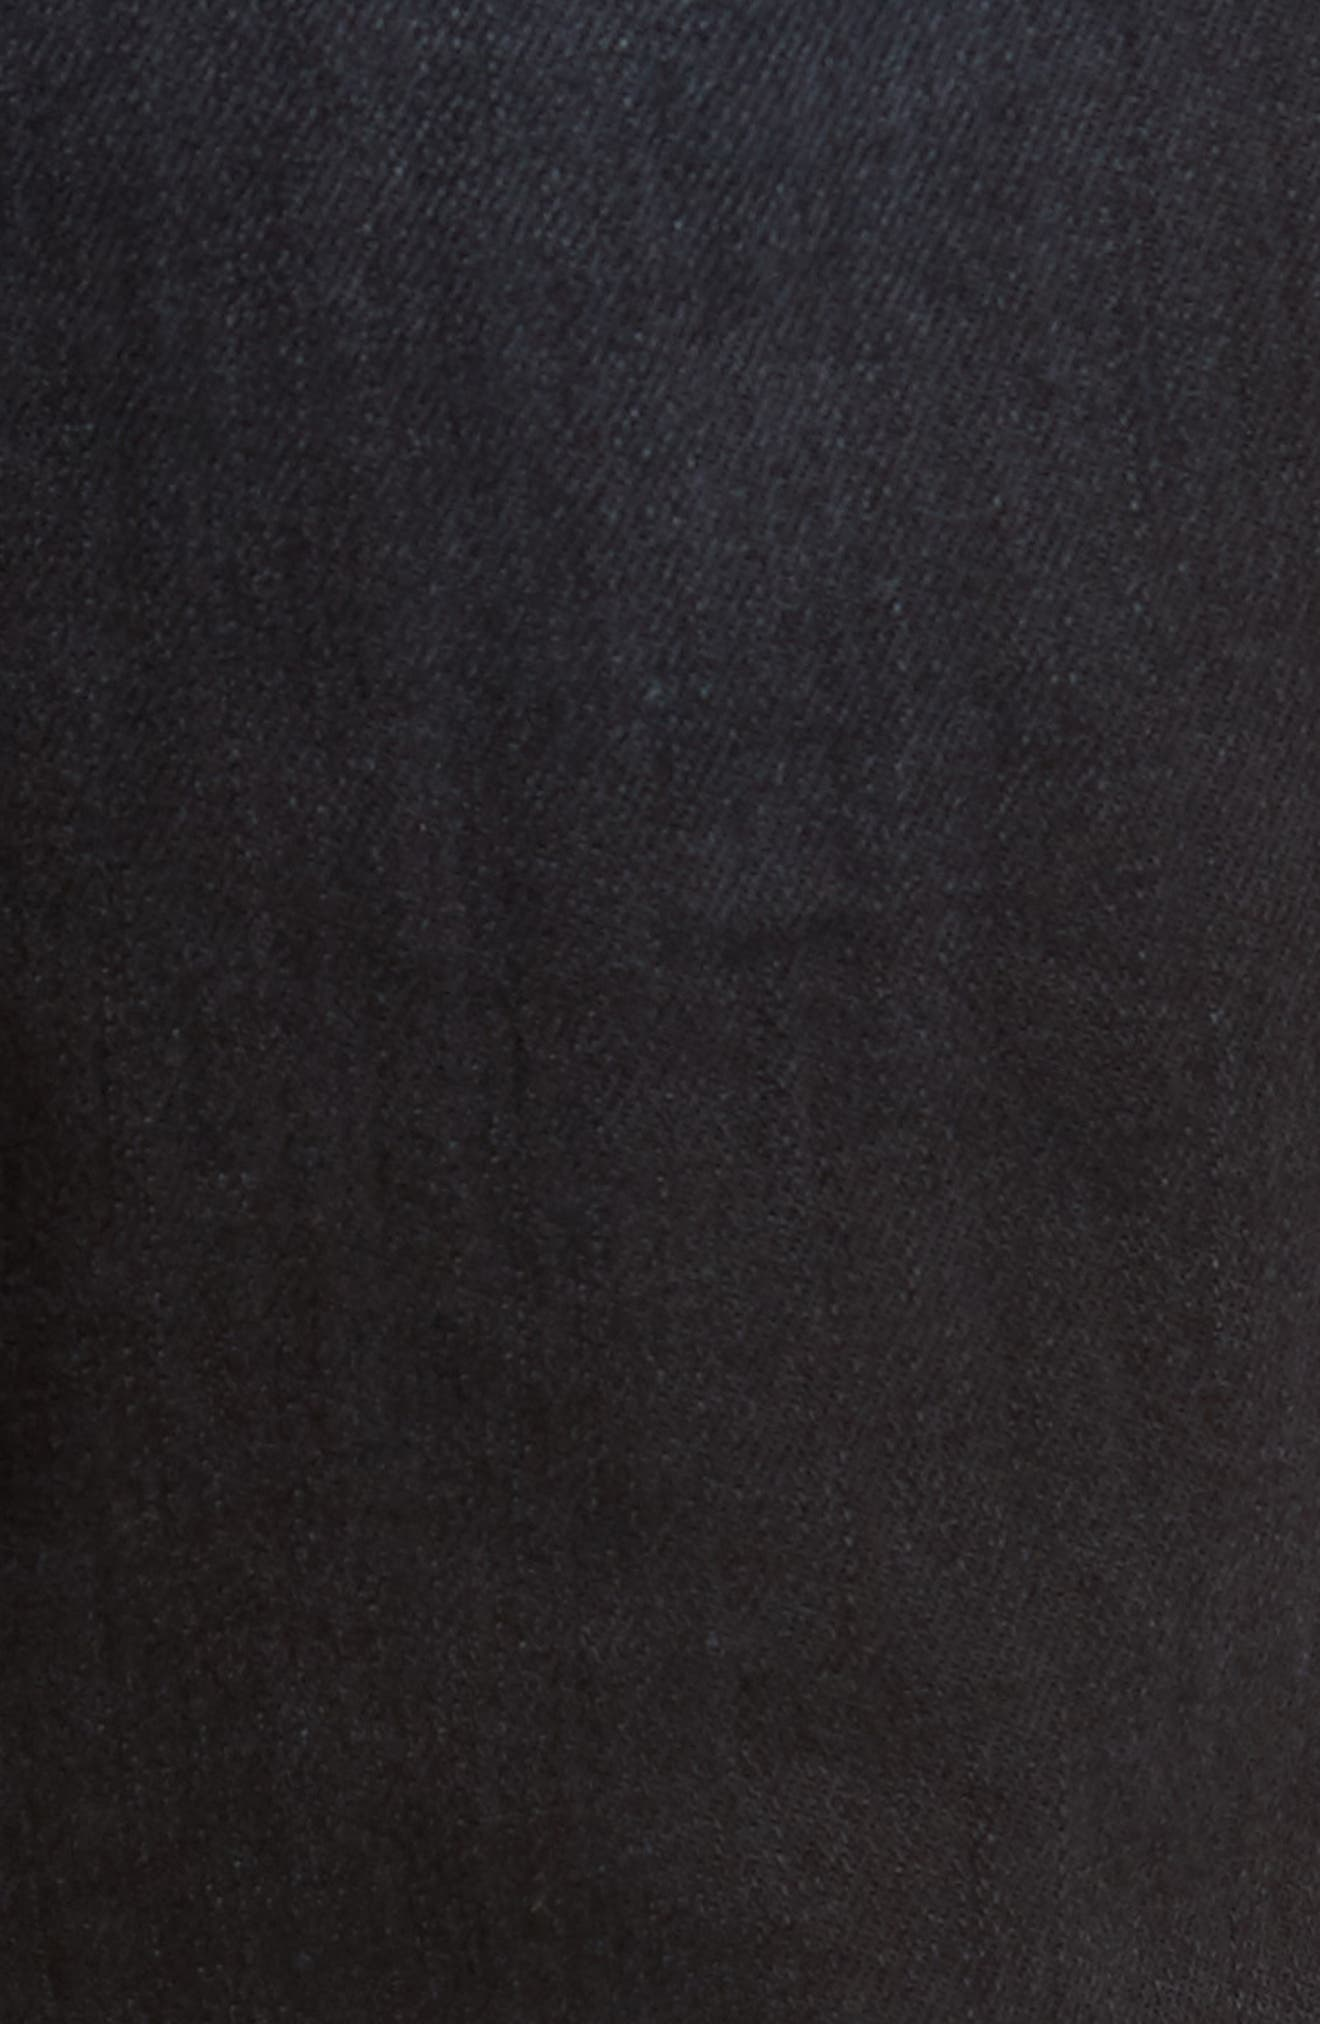 Sartor Skinny Fit Jeans,                             Alternate thumbnail 5, color,                             Low Key